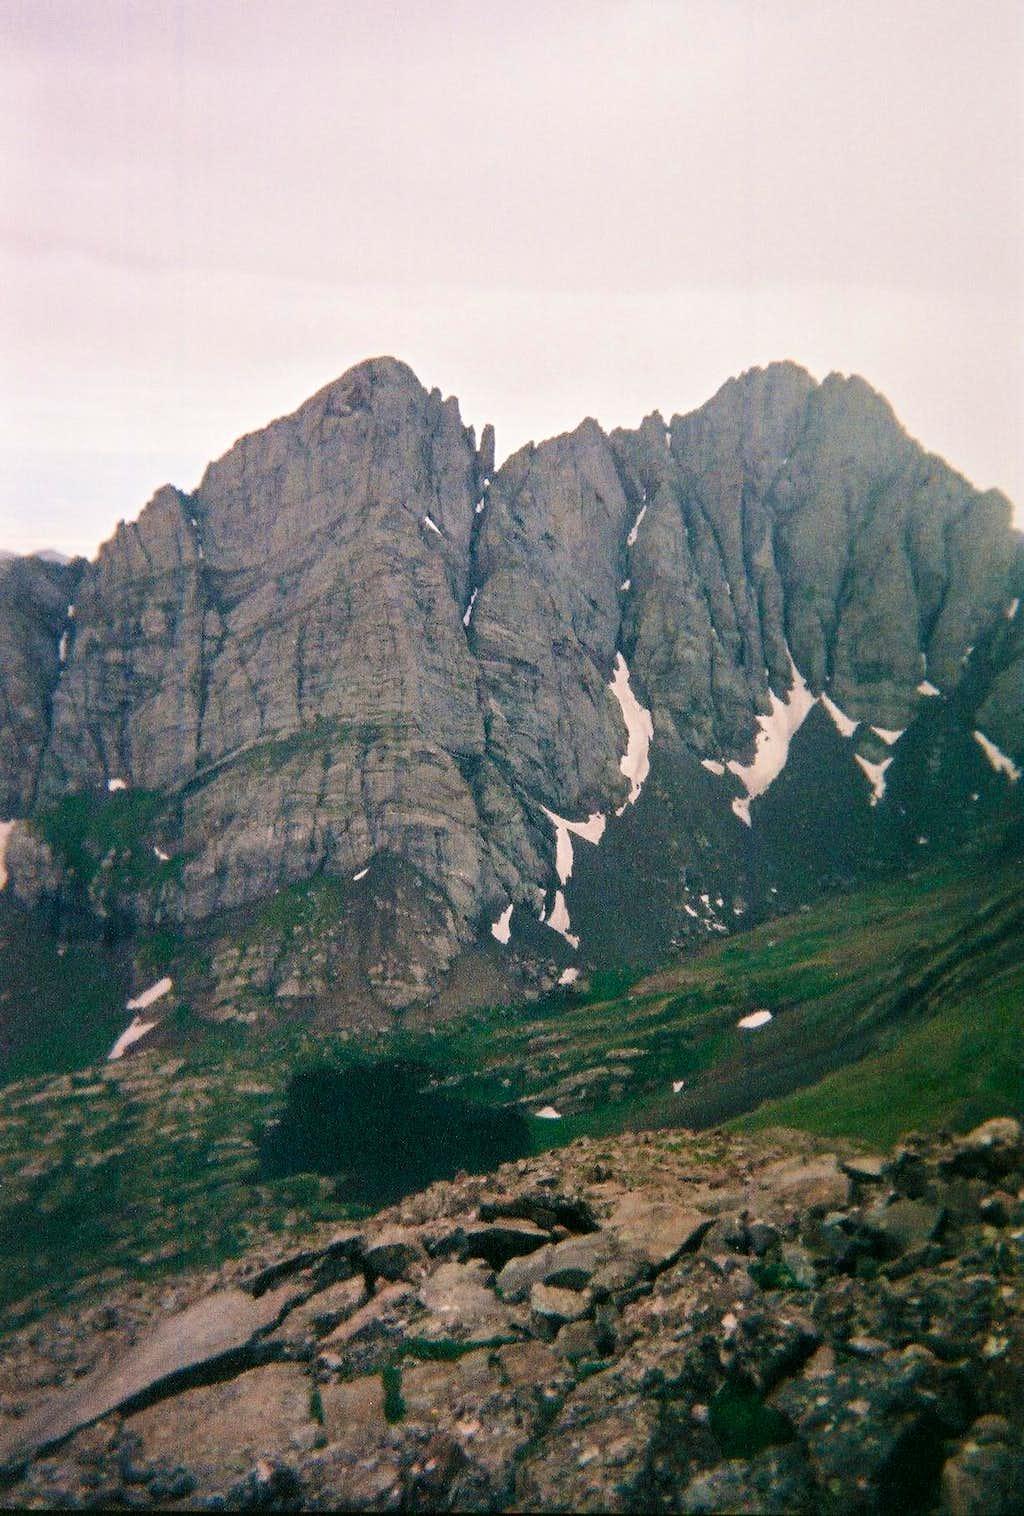 Crestone Needle & Crestone Peak